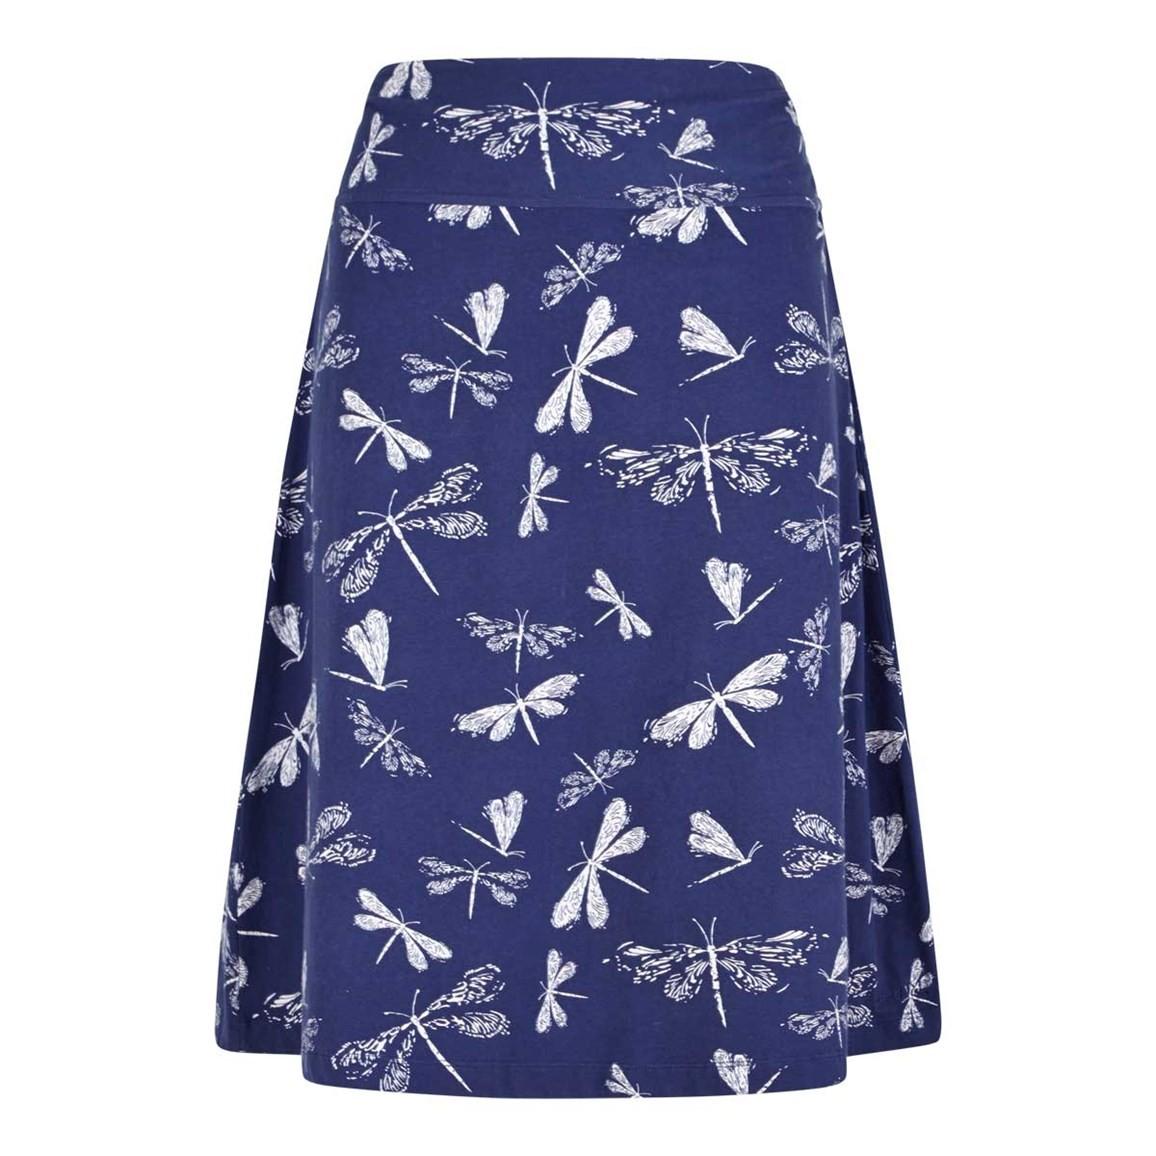 Weird Fish Malmo Printed Jersey Skirt Navy Blue